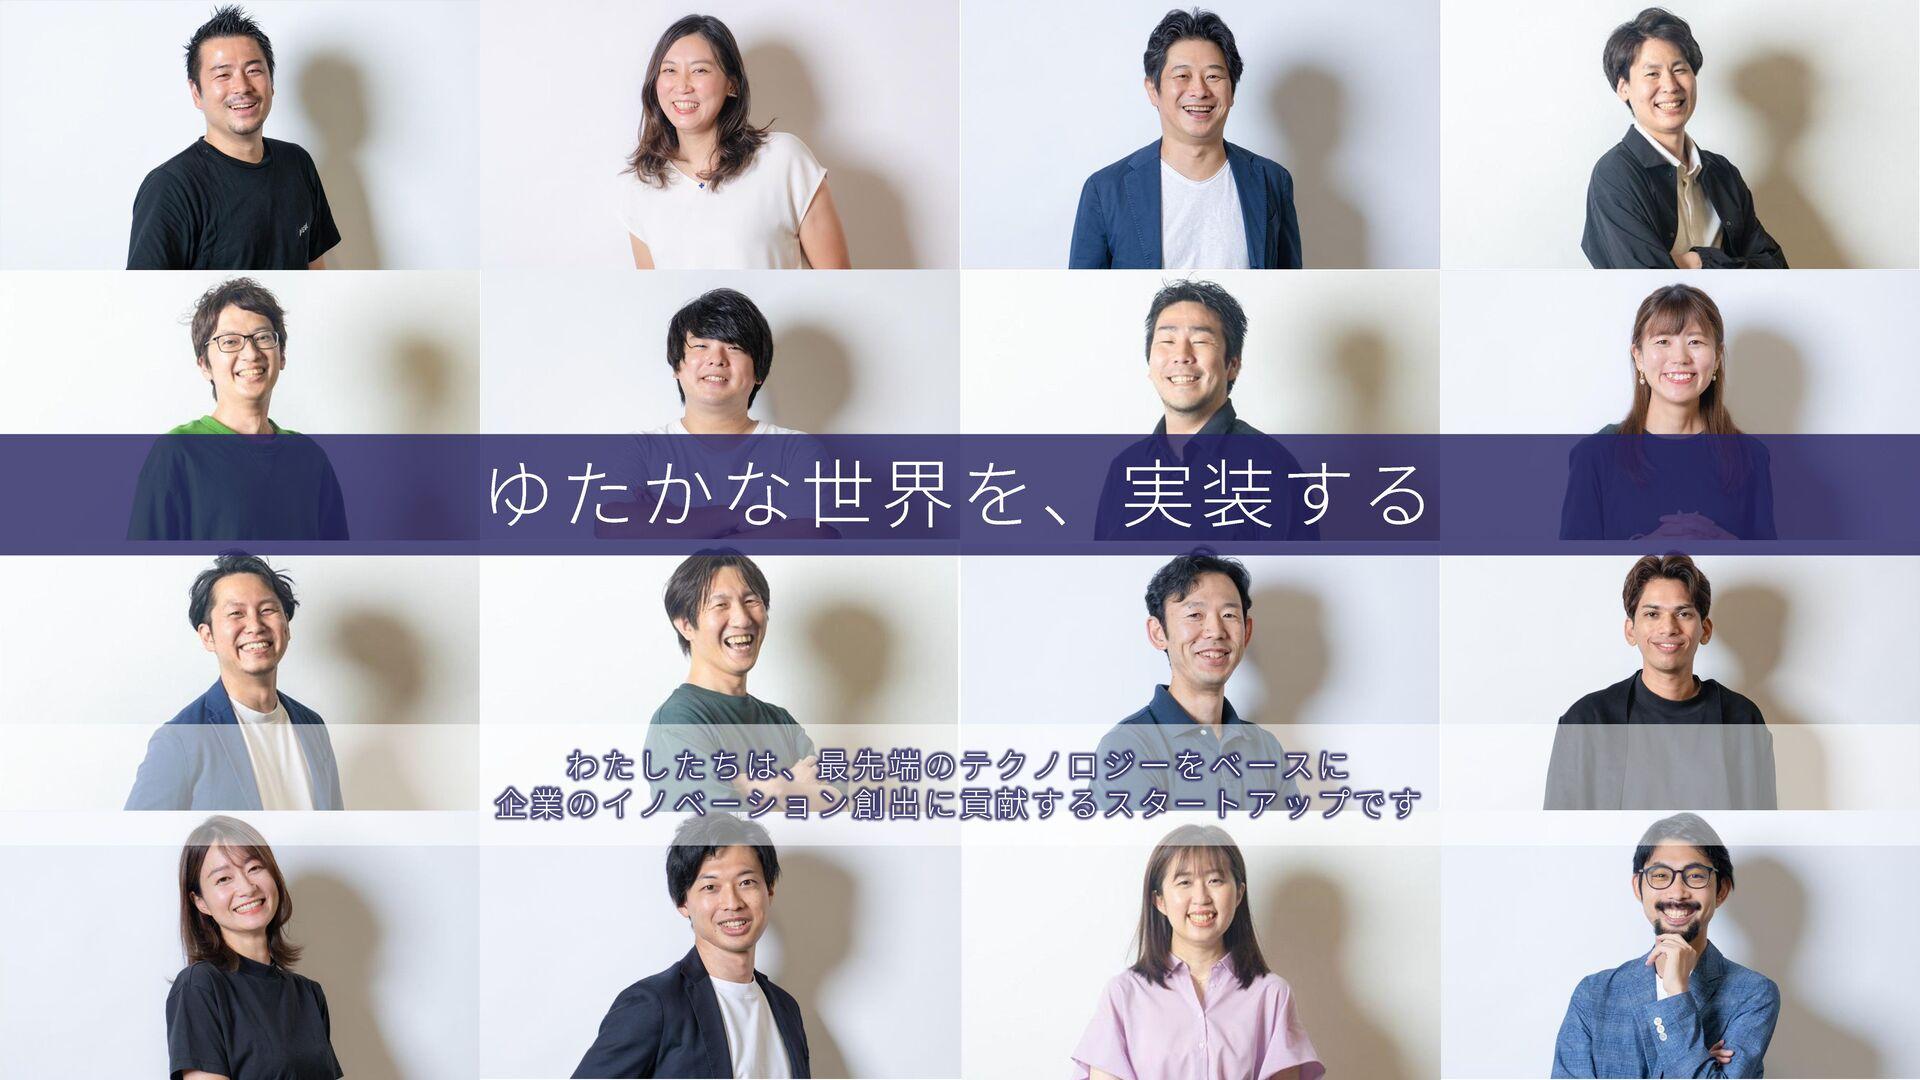 Confidential 5 ABEJAの世界観・使命 Tagline ゆたかな世界を、実装す...